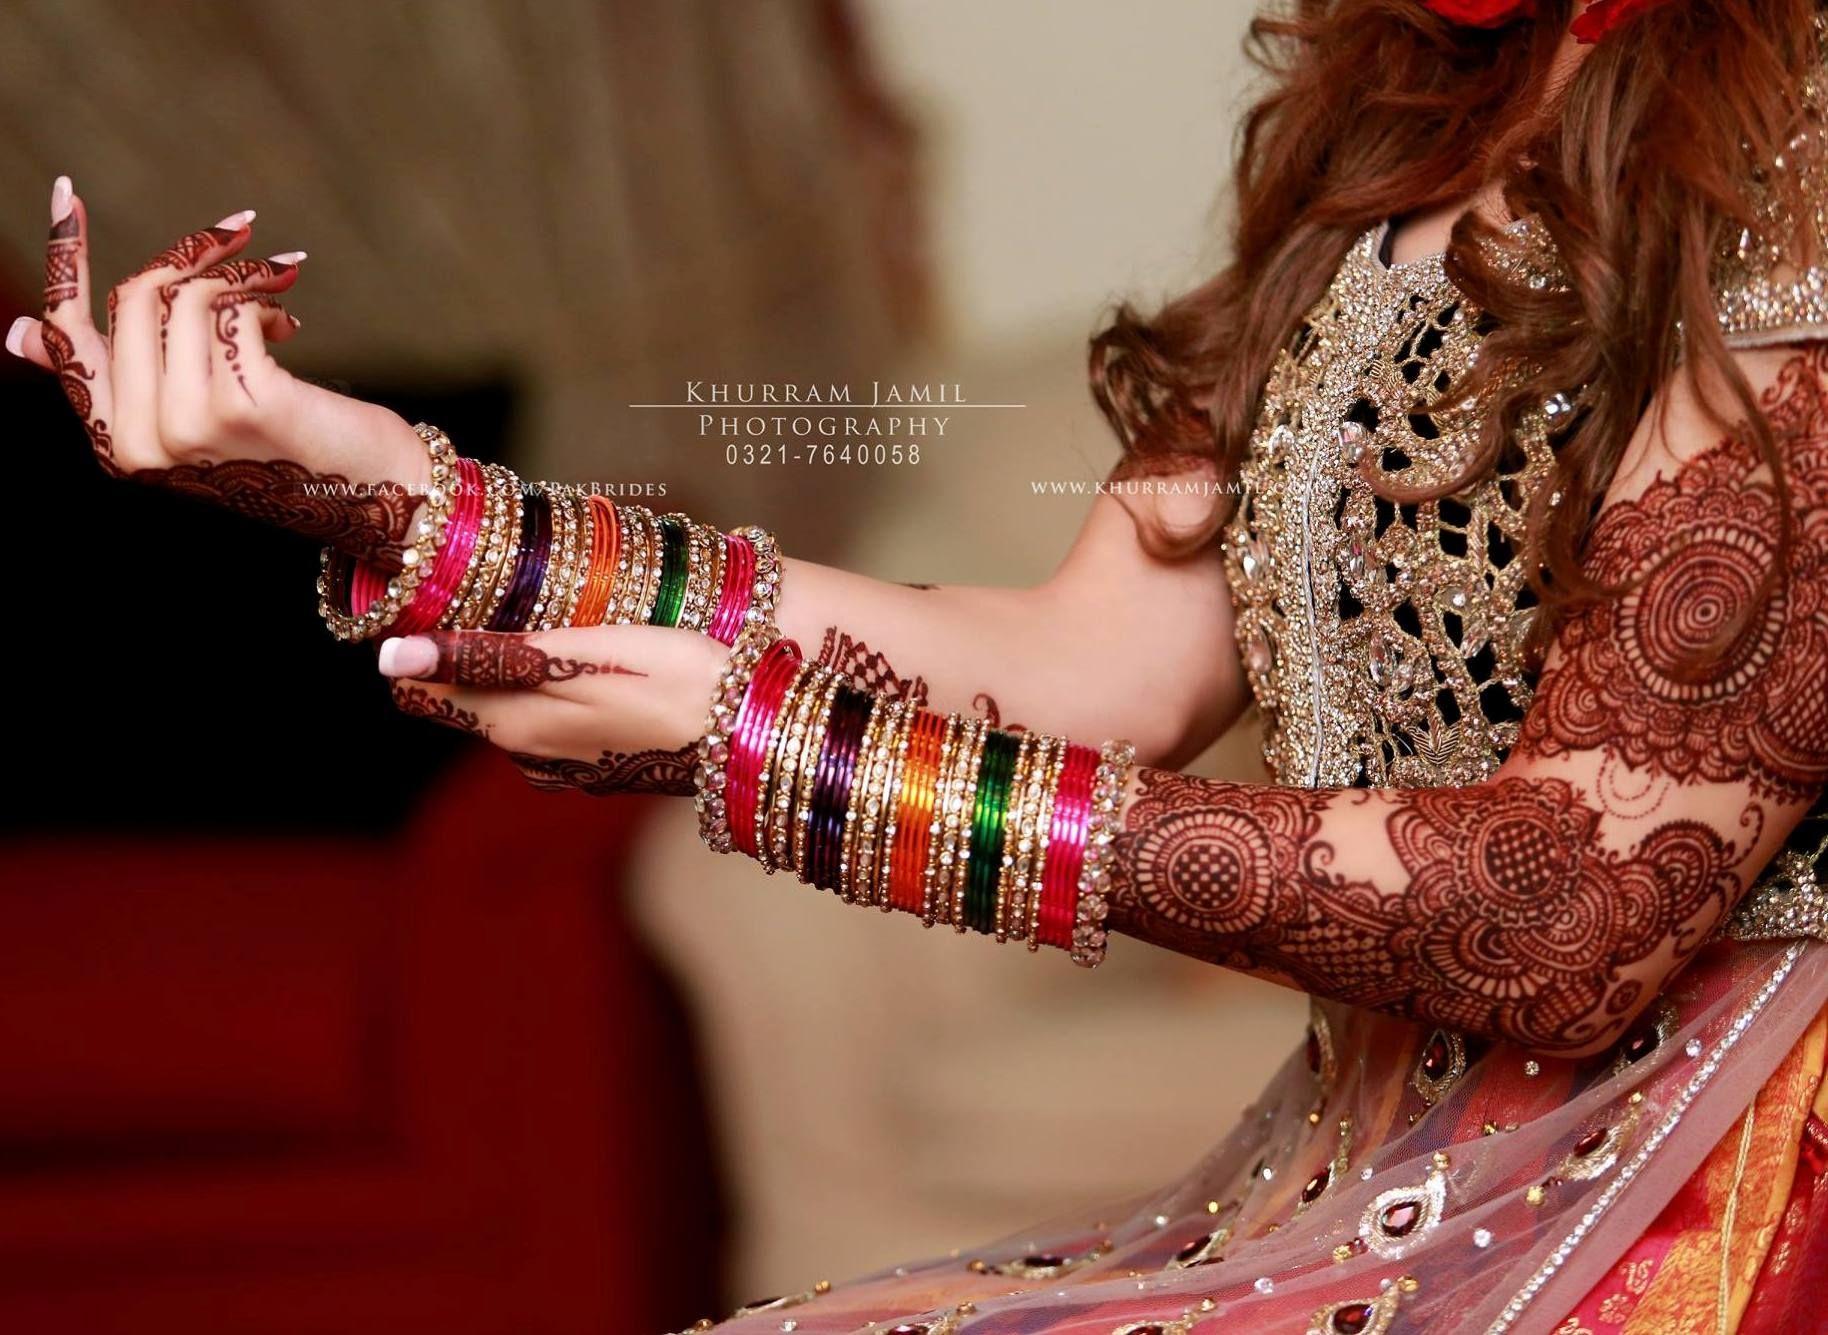 Pin mehndi and bangles display pics awesome dp wallpaper on pinterest - Indian Jewelry Mehndi Henna Bangles